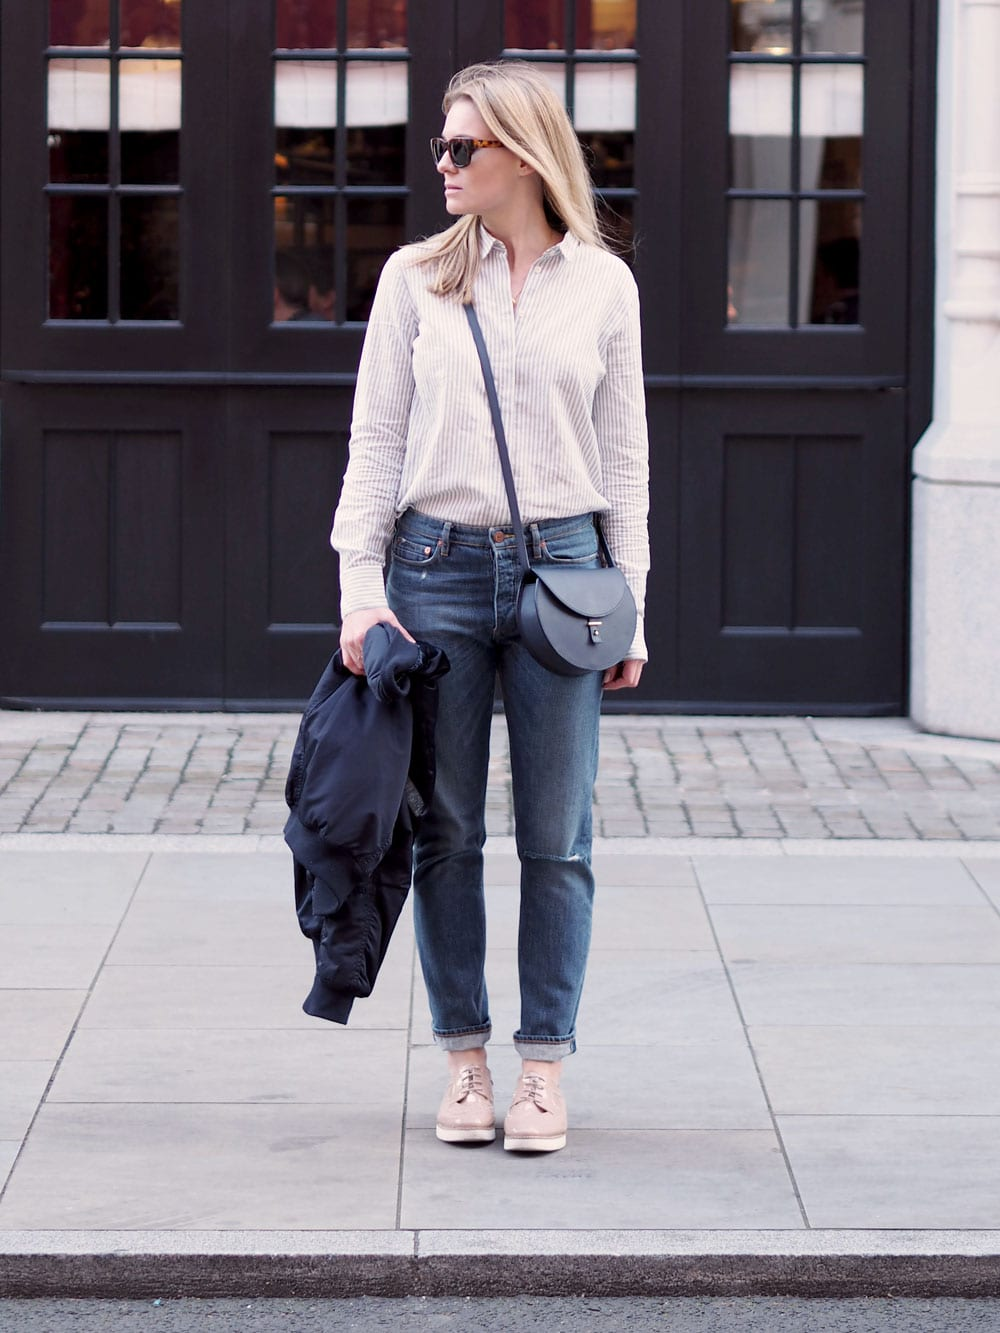 Style&Minimalism | It's Personal | Samsøe Jeans, Topshop Bomber, Second Female Shirt, Triwa Sunglasses, PB 0110 Bag